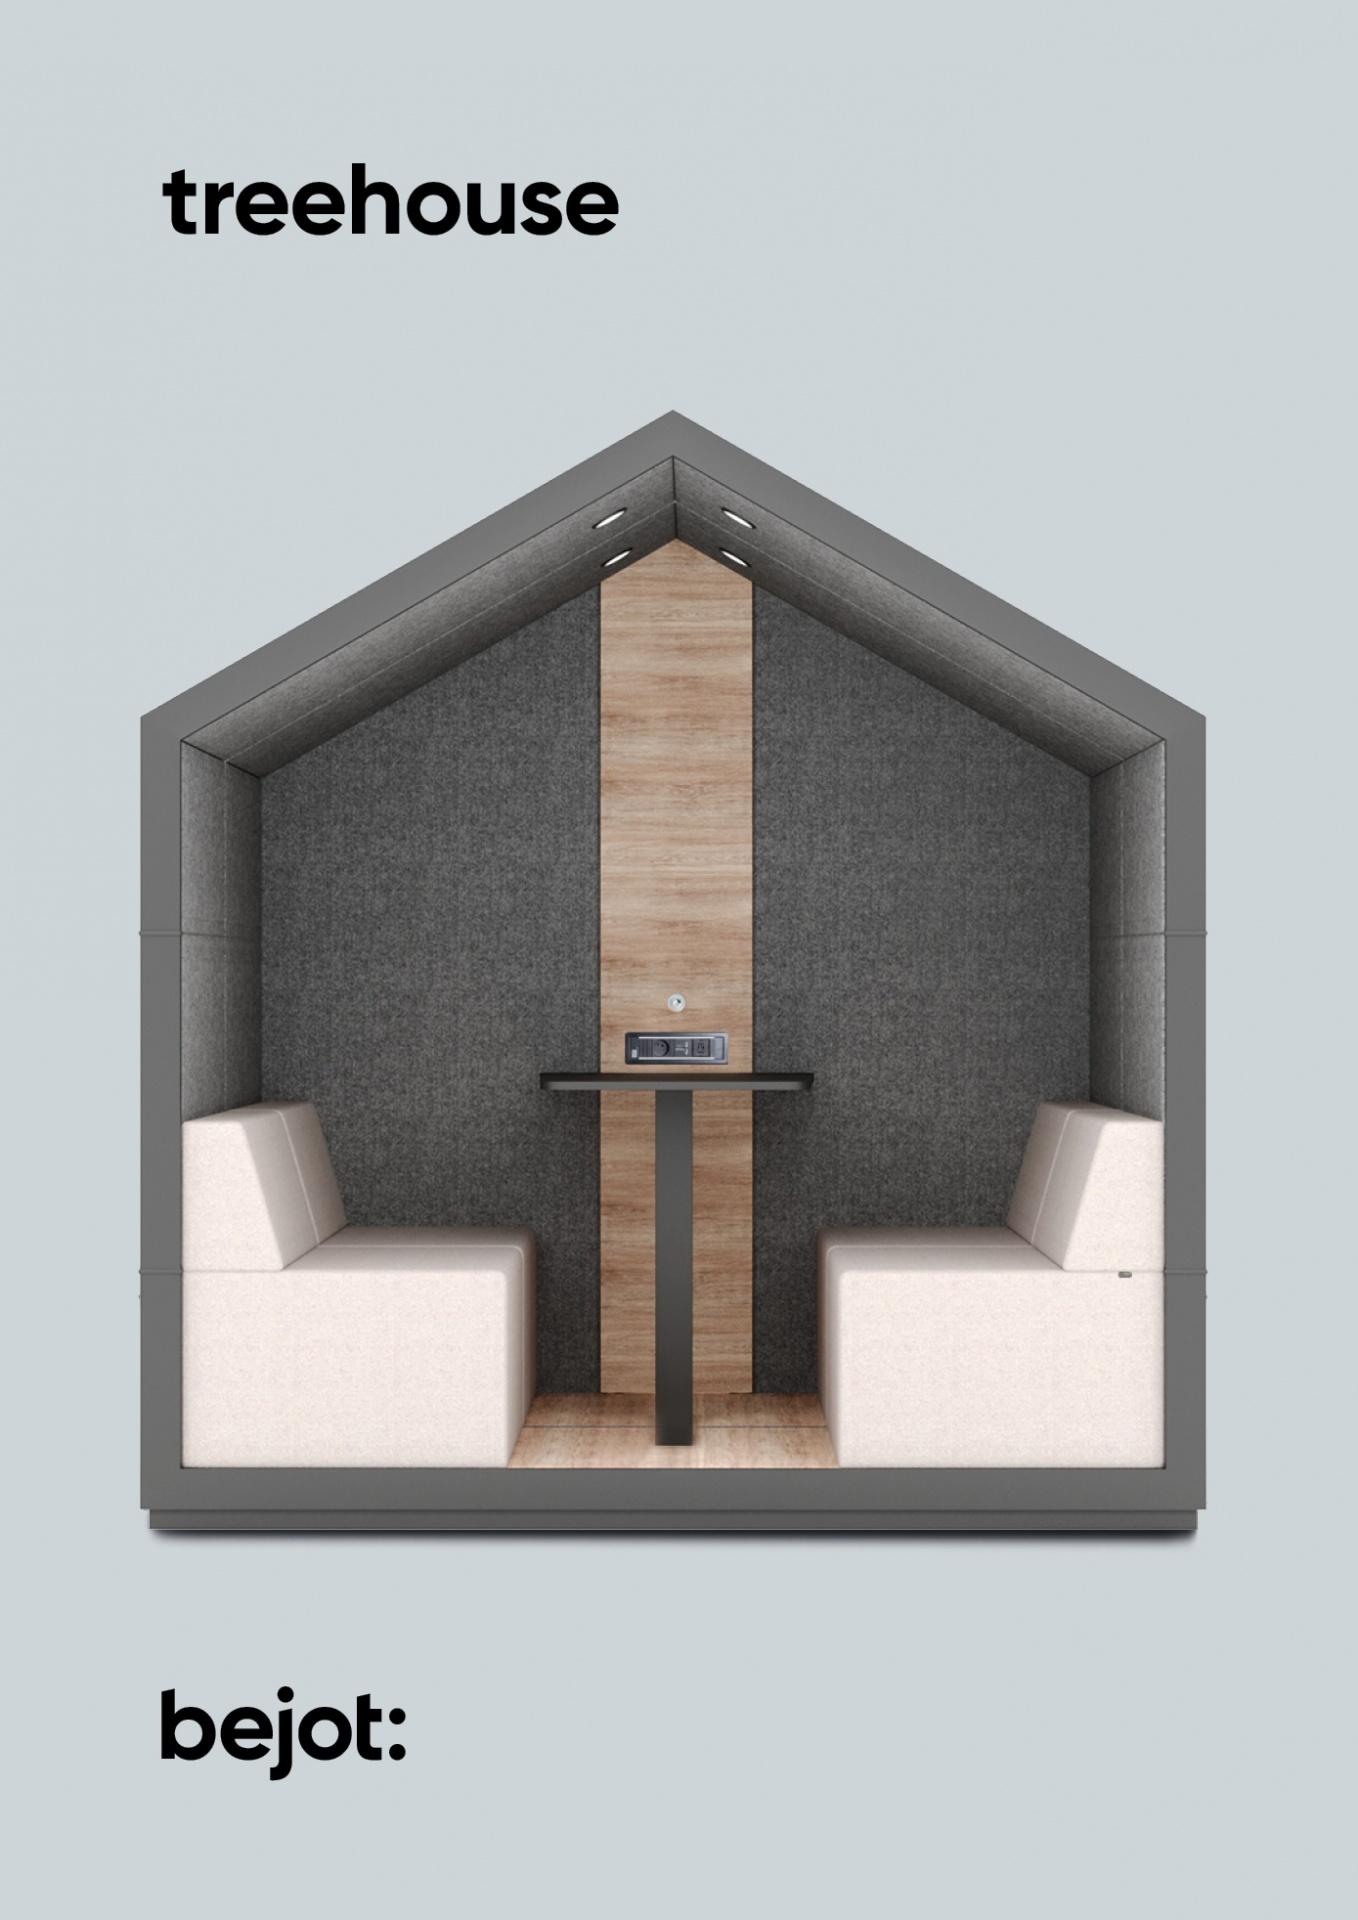 treehouse-akustik-moebel-4-person1.jpg